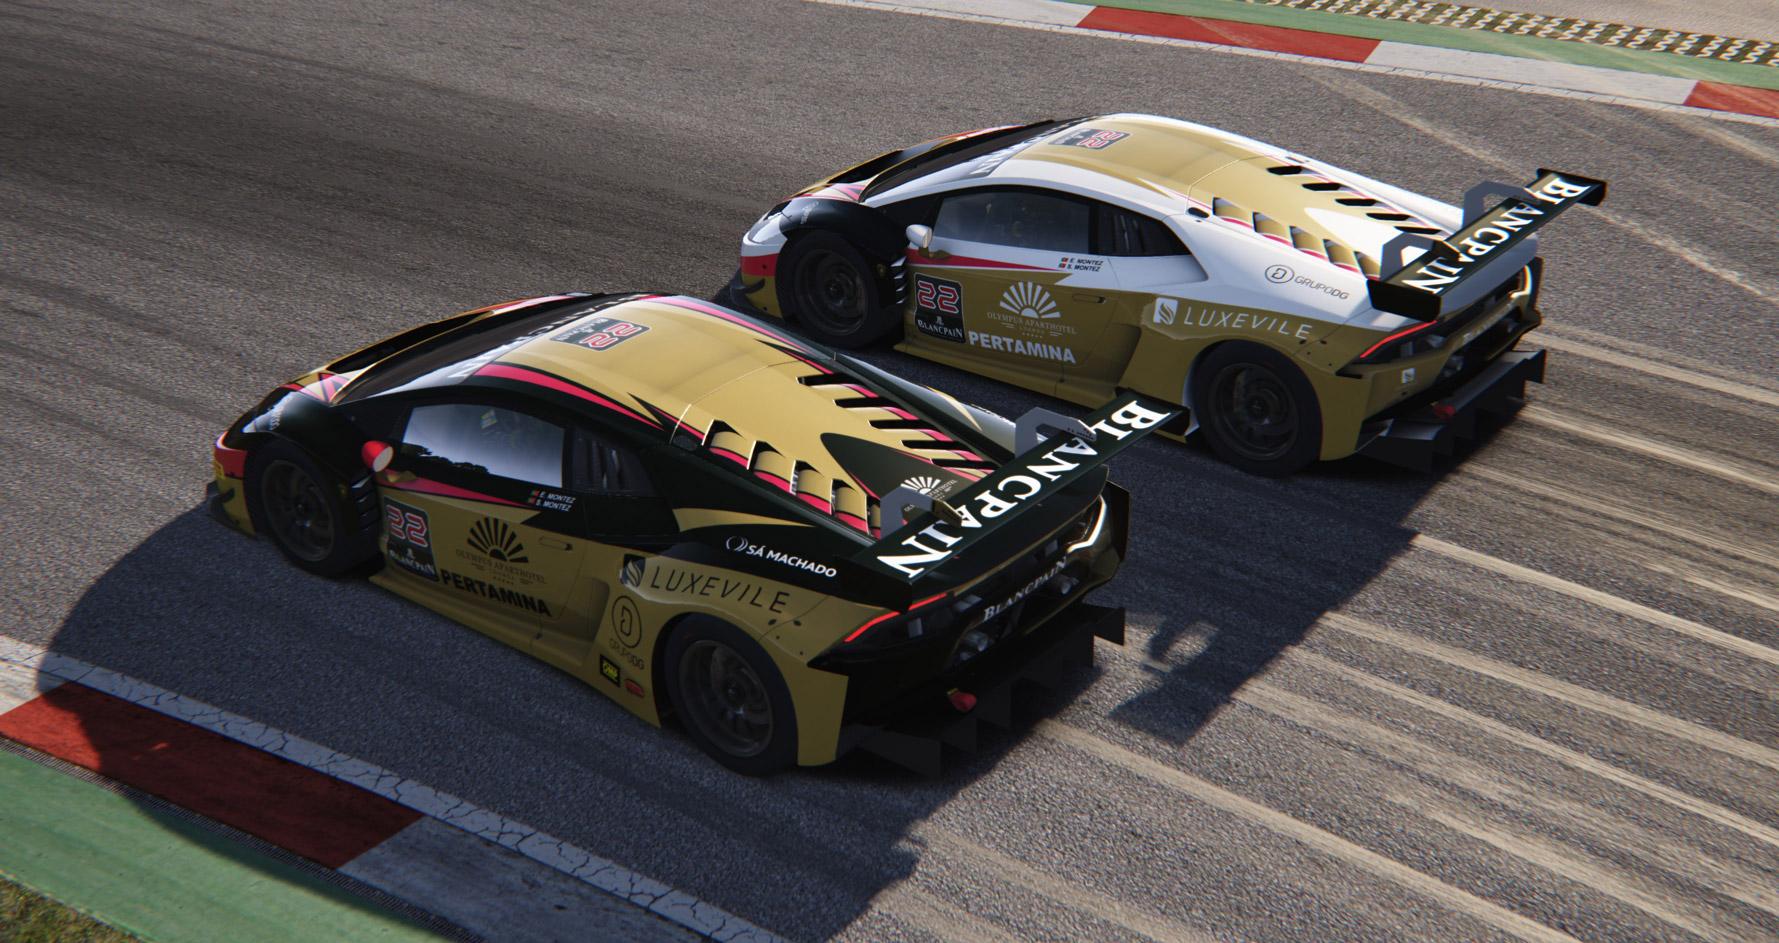 Screenshot_ks_lamborghini_huracan_gt3_nurburgring-sprint_20-10-115-0-47-20.jpg